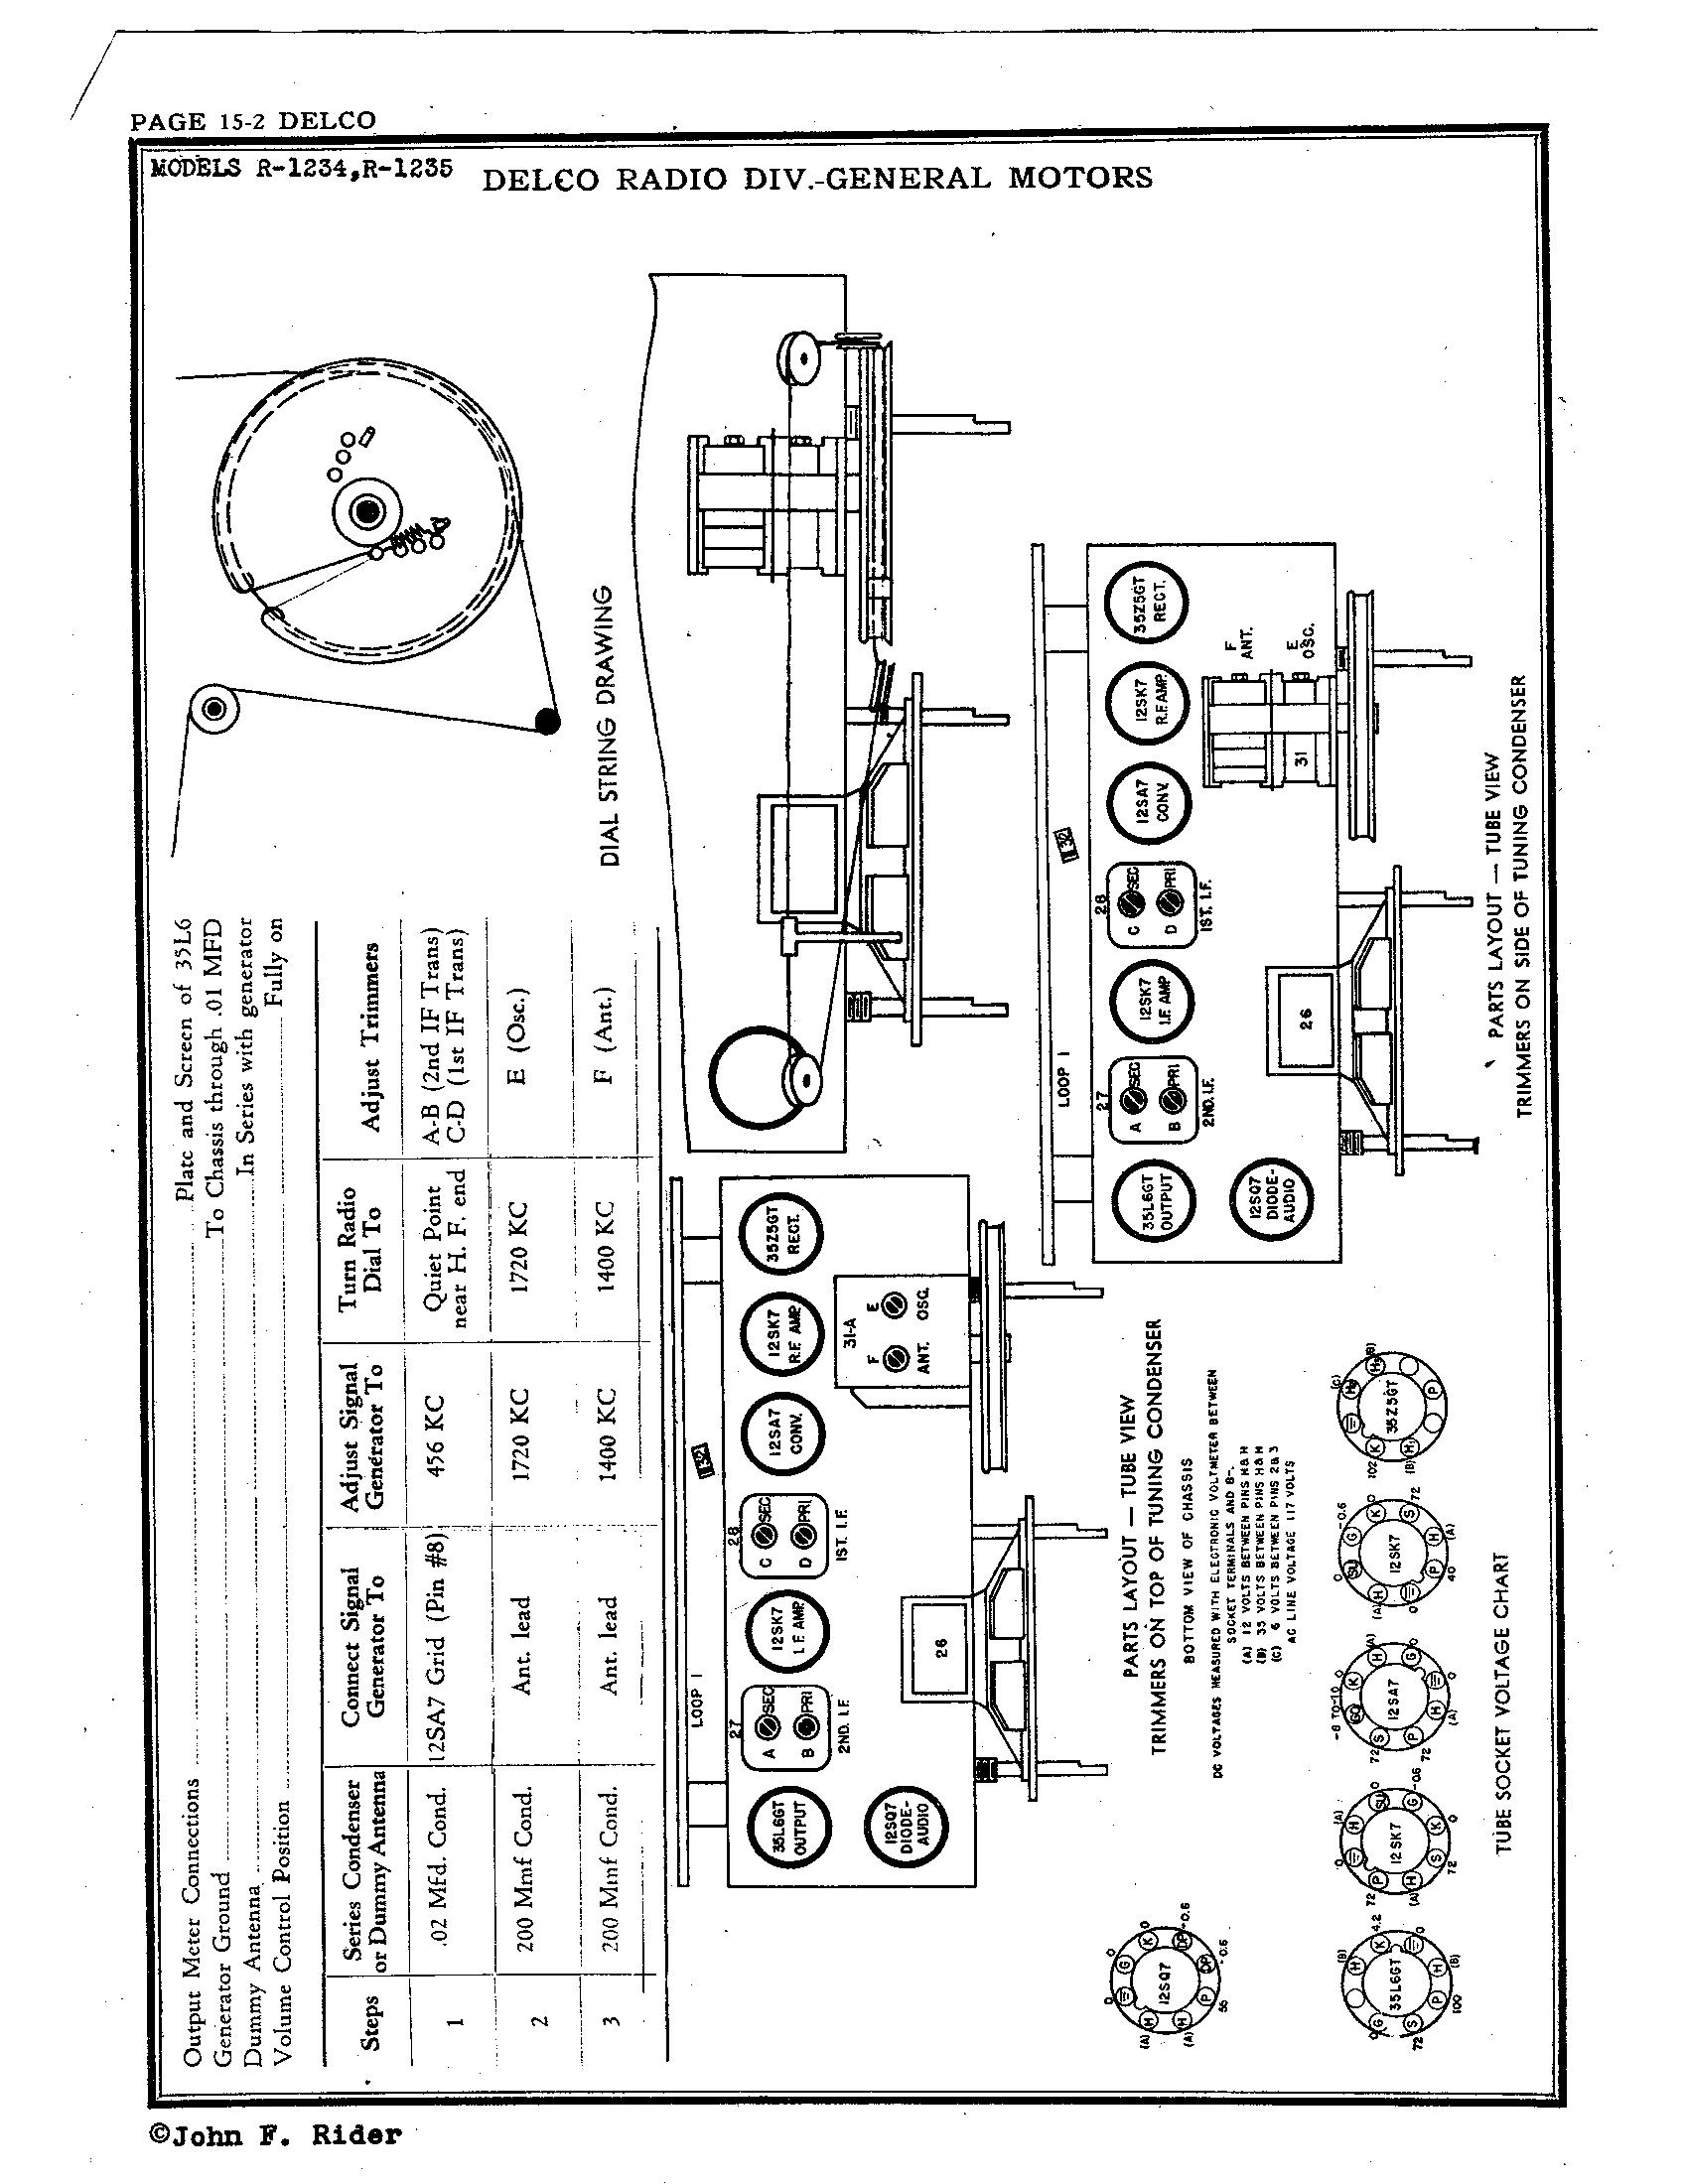 hight resolution of delco radio schematics wiring diagram hostdelco radio schematics wiring diagram home delco car radio schematics delco